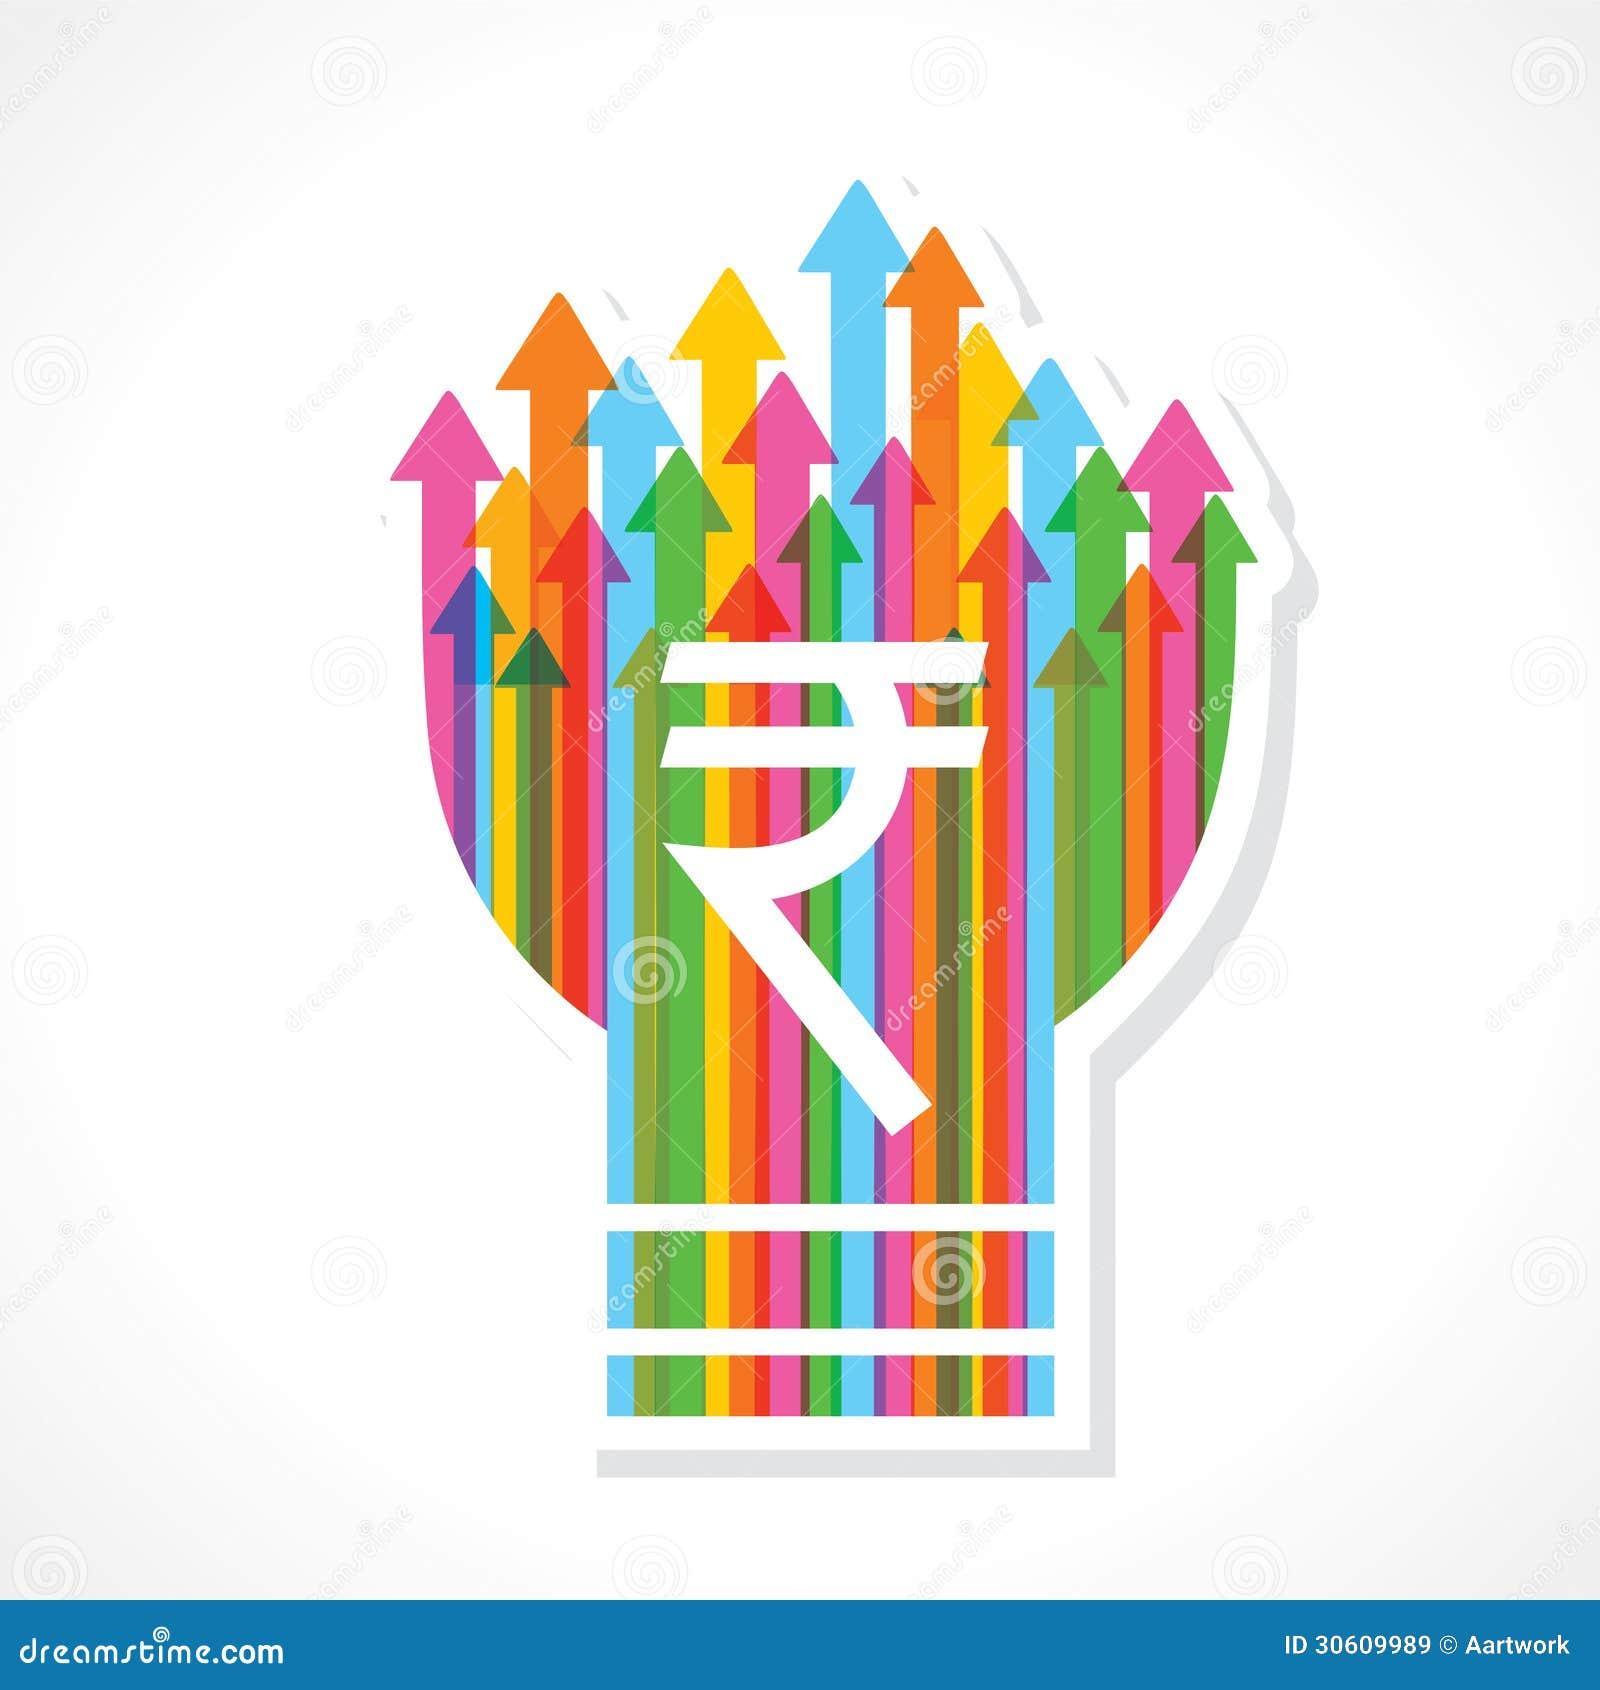 Rupee symbol on colorful arrow bulb stock vector illustration of rupee symbol on colorful arrow bulb biocorpaavc